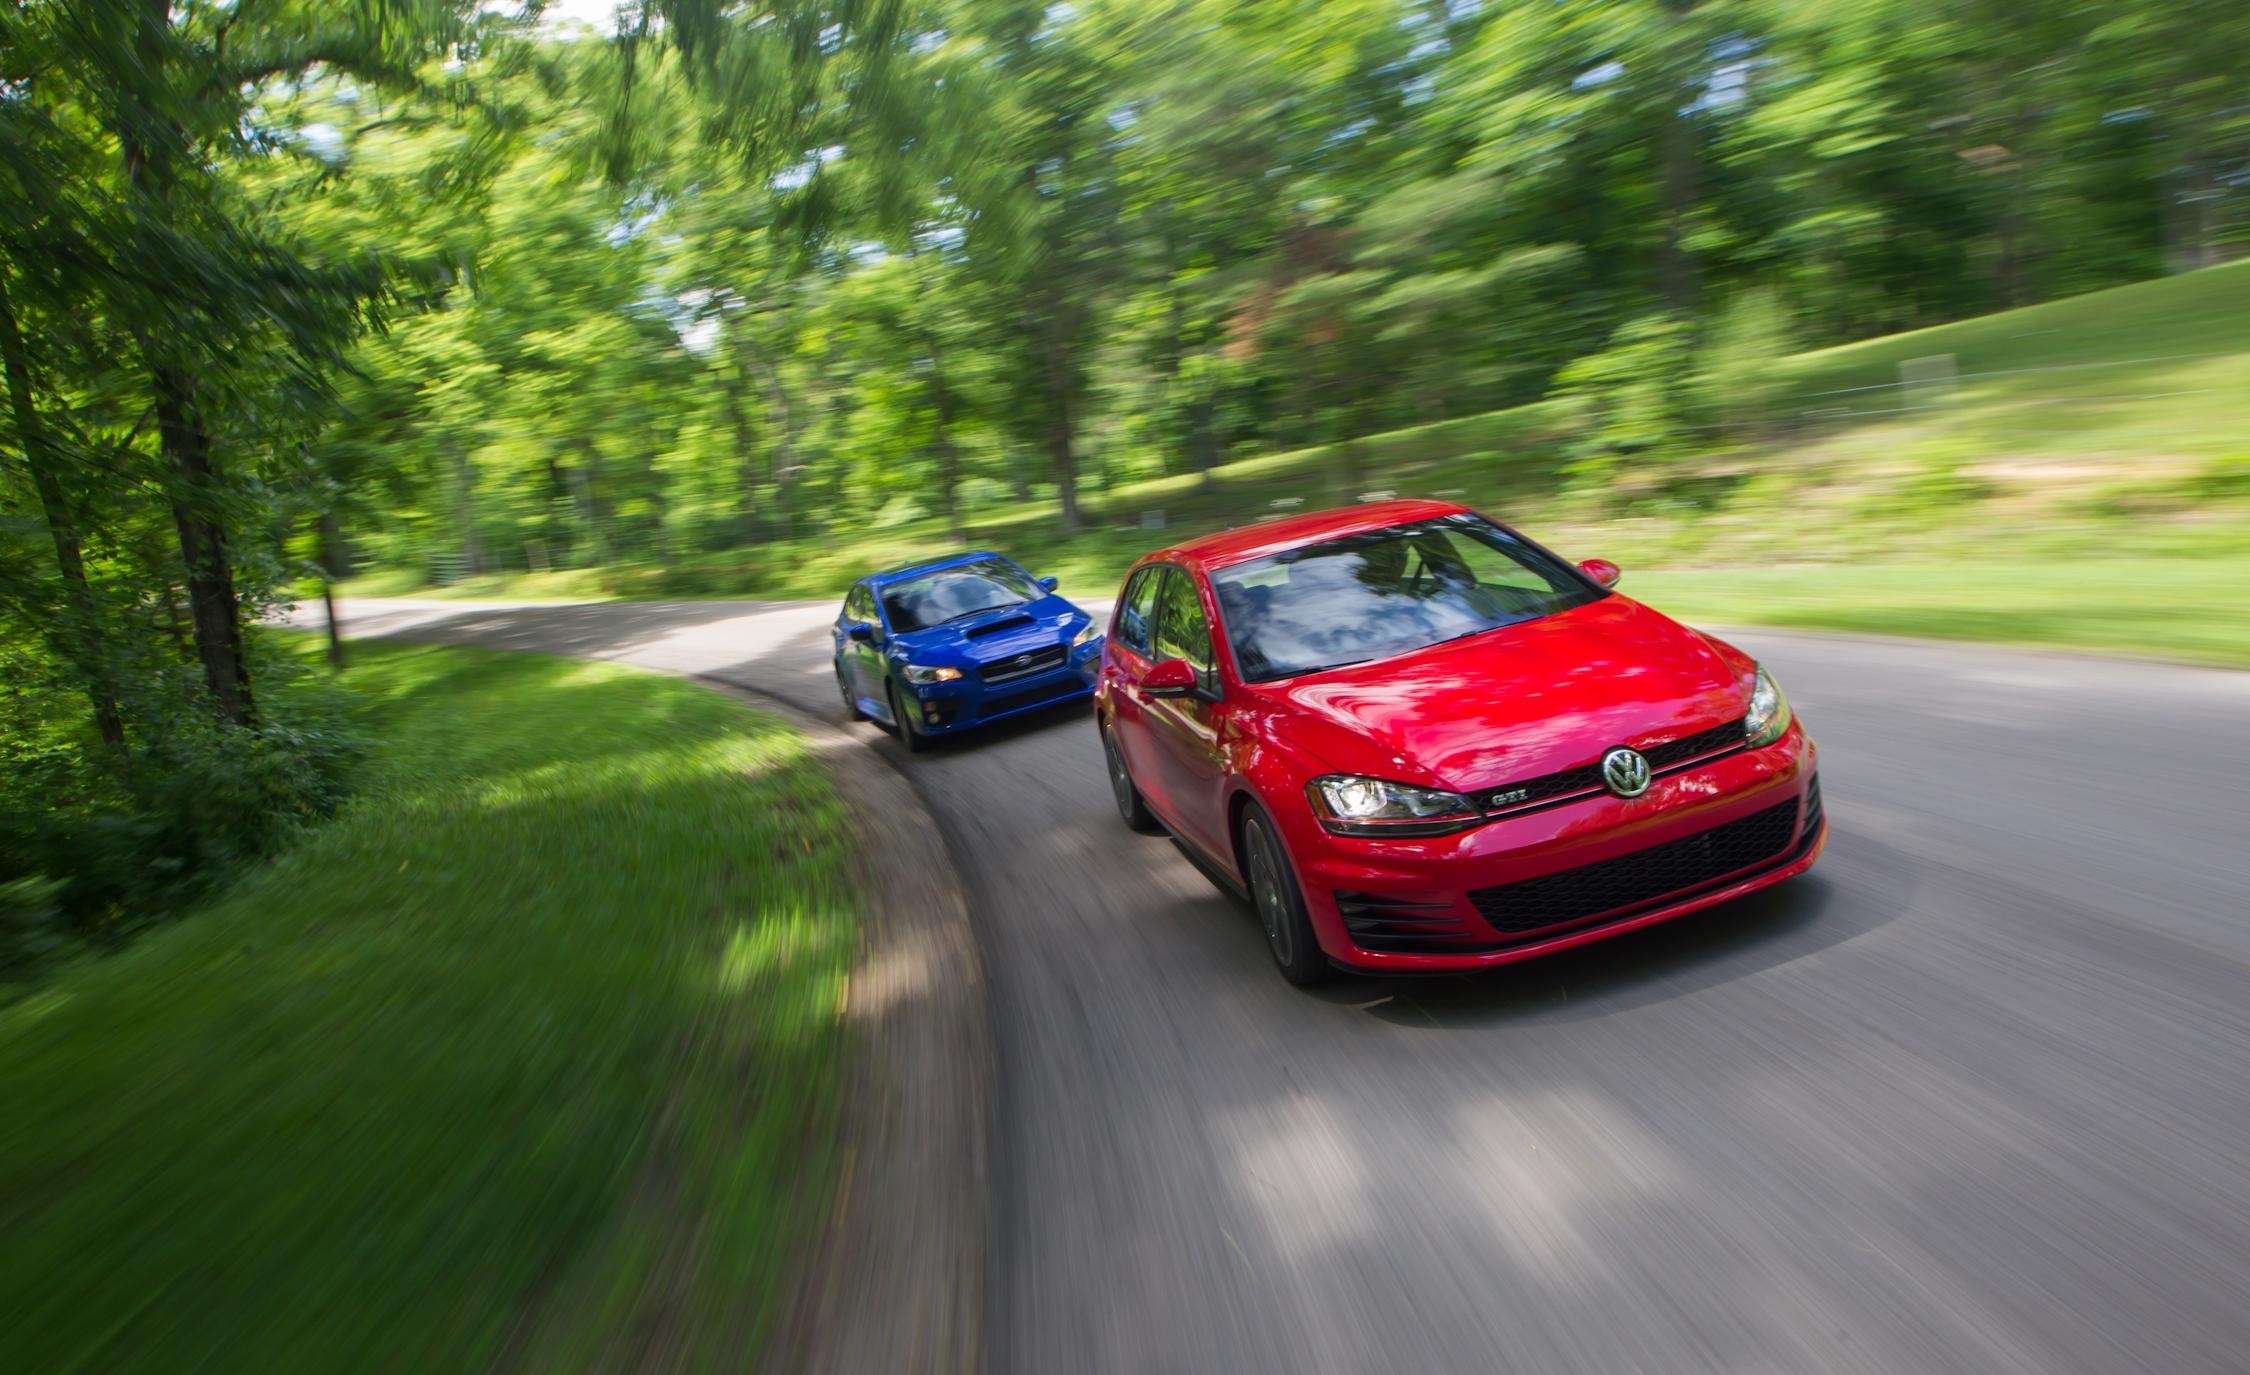 Test Drive 2015 Volkswagen GTI vs 2015 Subaru WRX